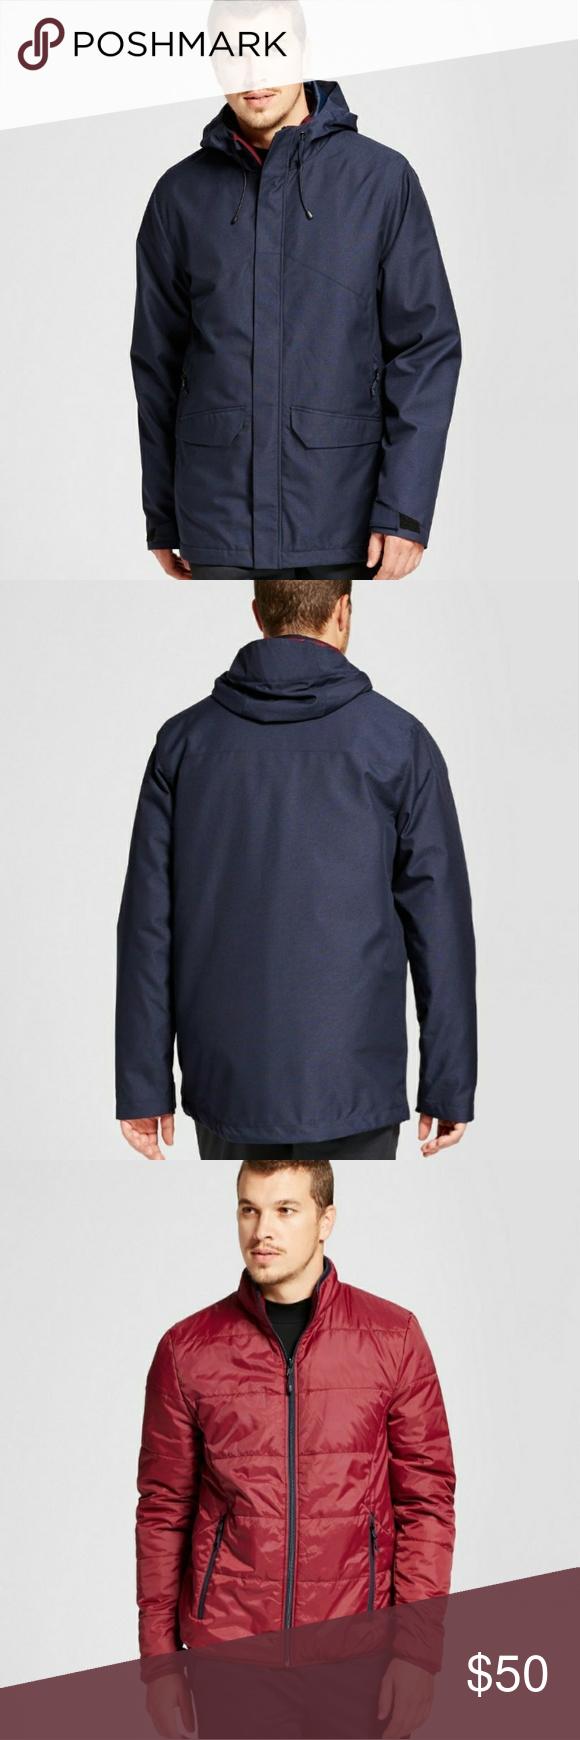 Men S 3 In 1 Jacket C9 Champion Champion Jacket Jackets Mens Jackets [ 1740 x 580 Pixel ]